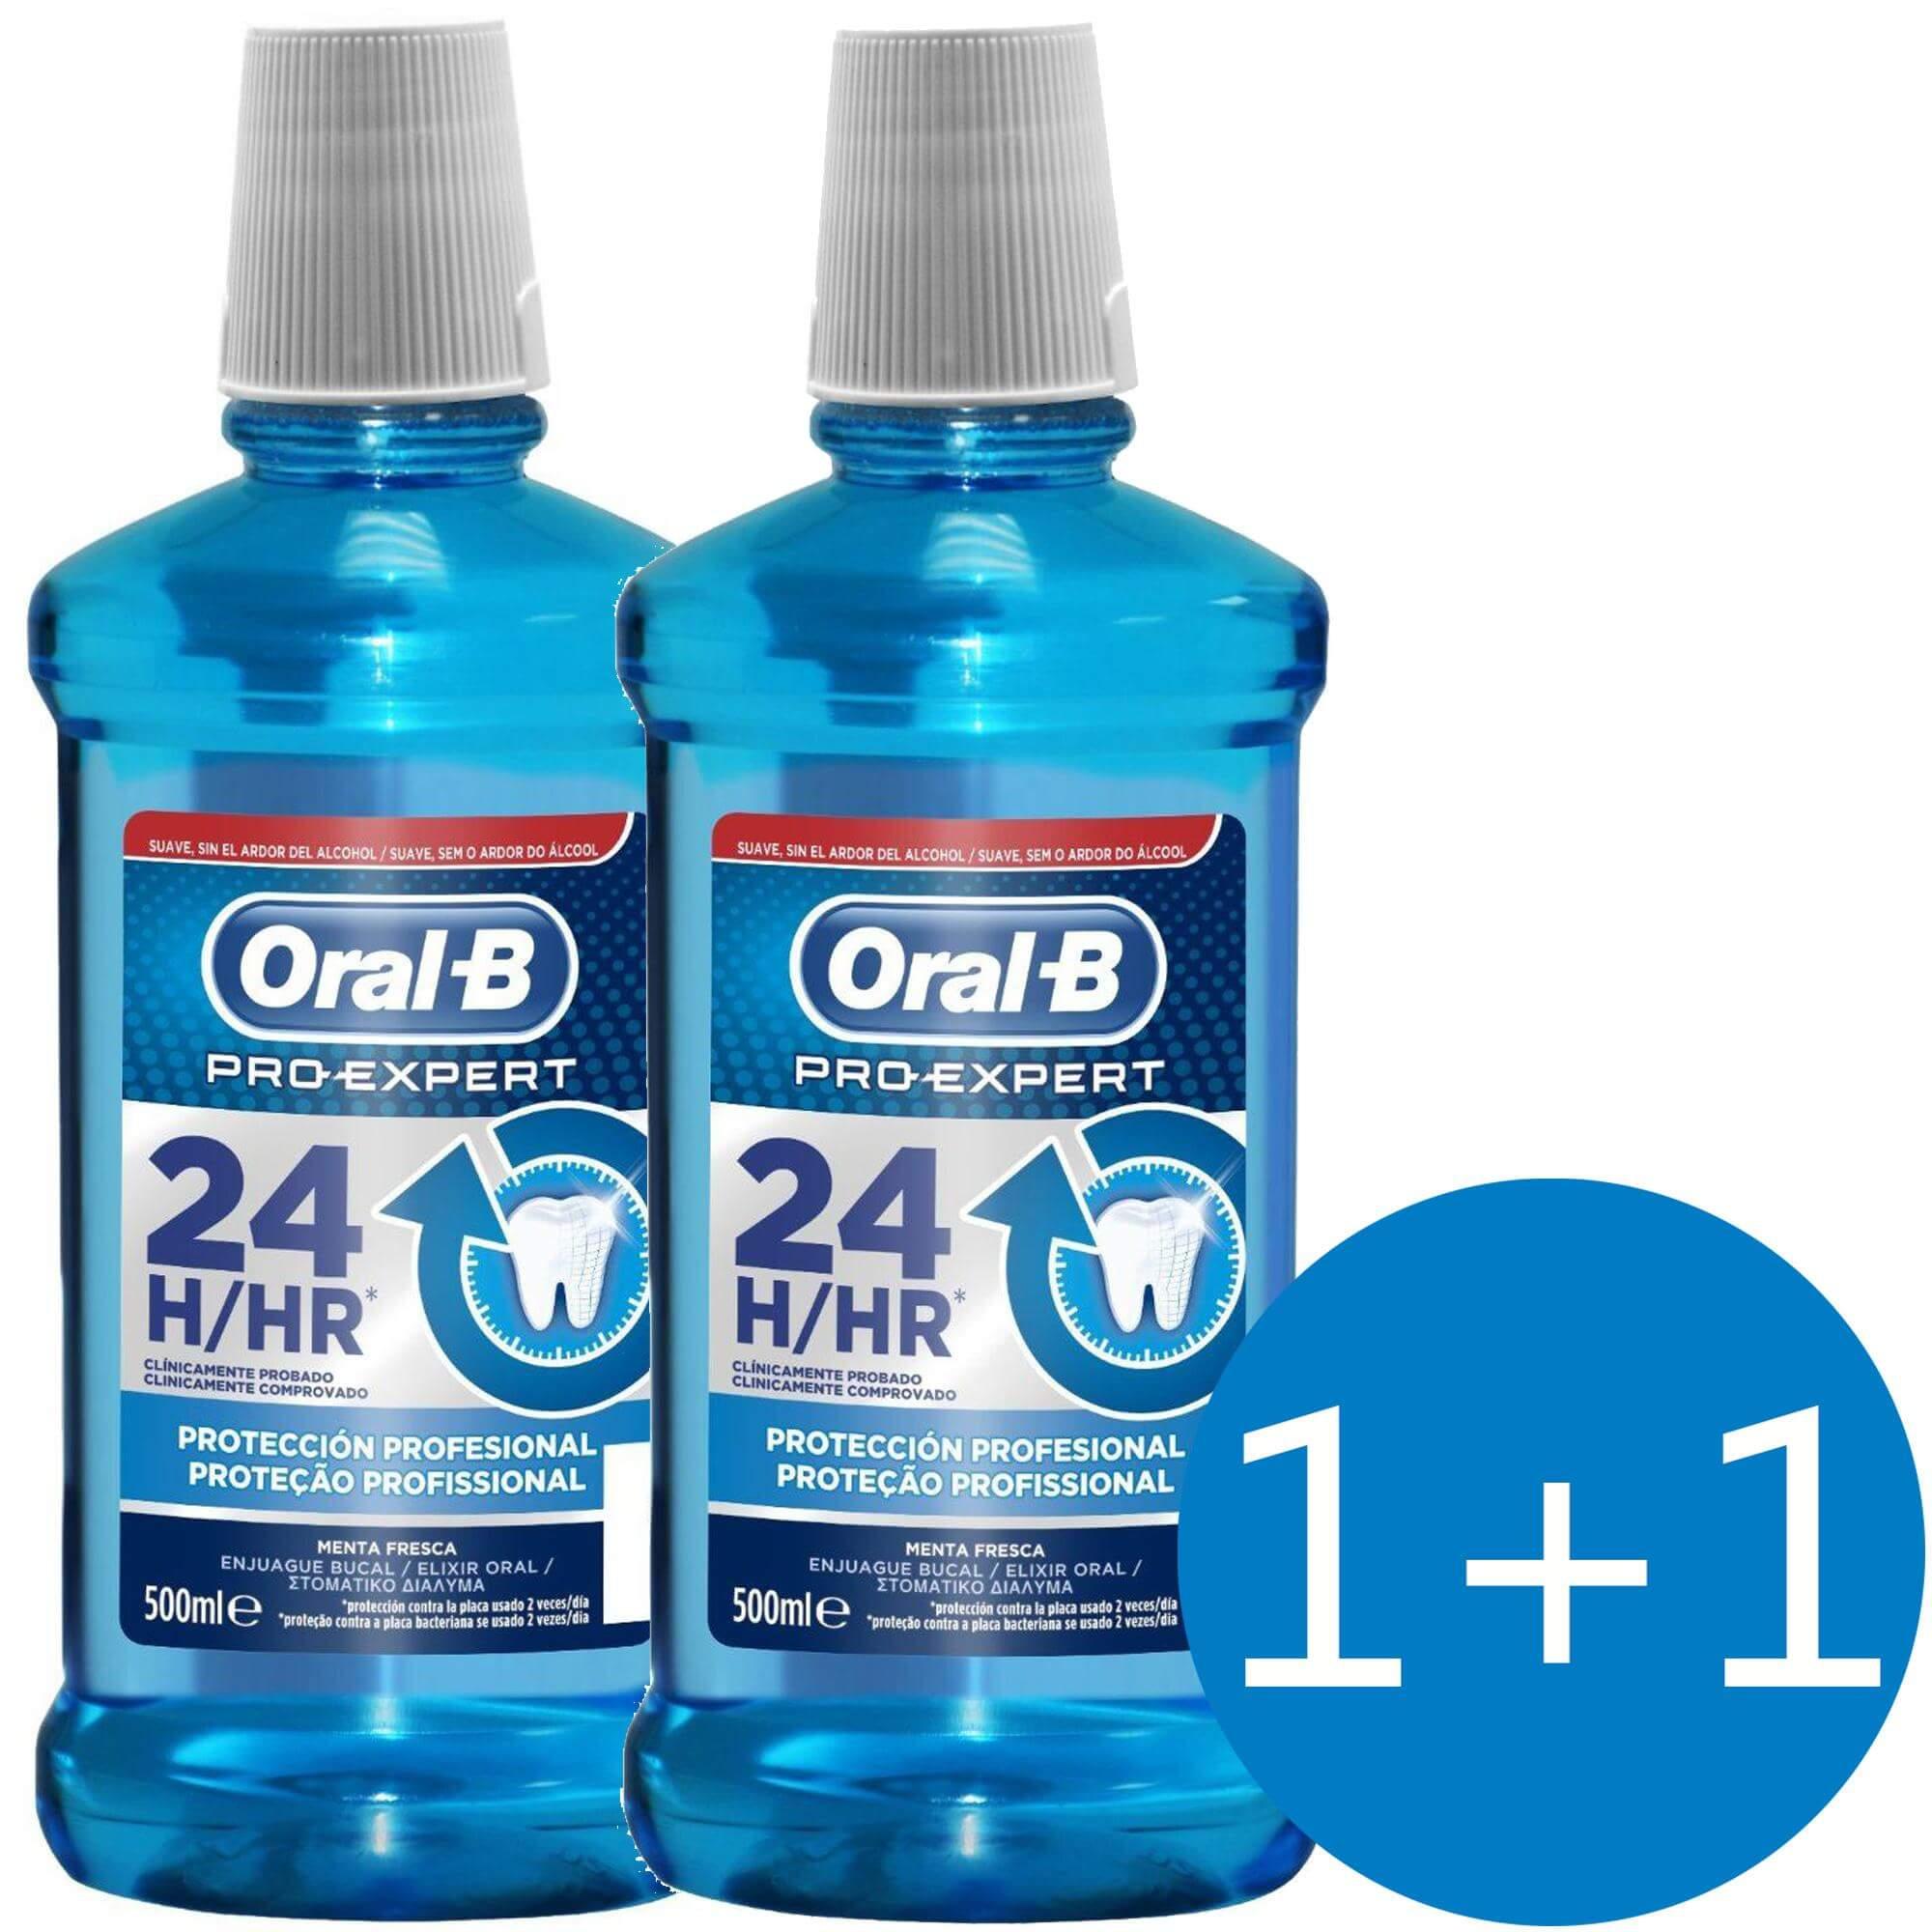 Oral b Πακέτο Προσφοράς Pro Expert 24hr Professional Protection Στοματικό Διάλυμα για 24ωρη Προστασία 500ml 1+1 Δώρο